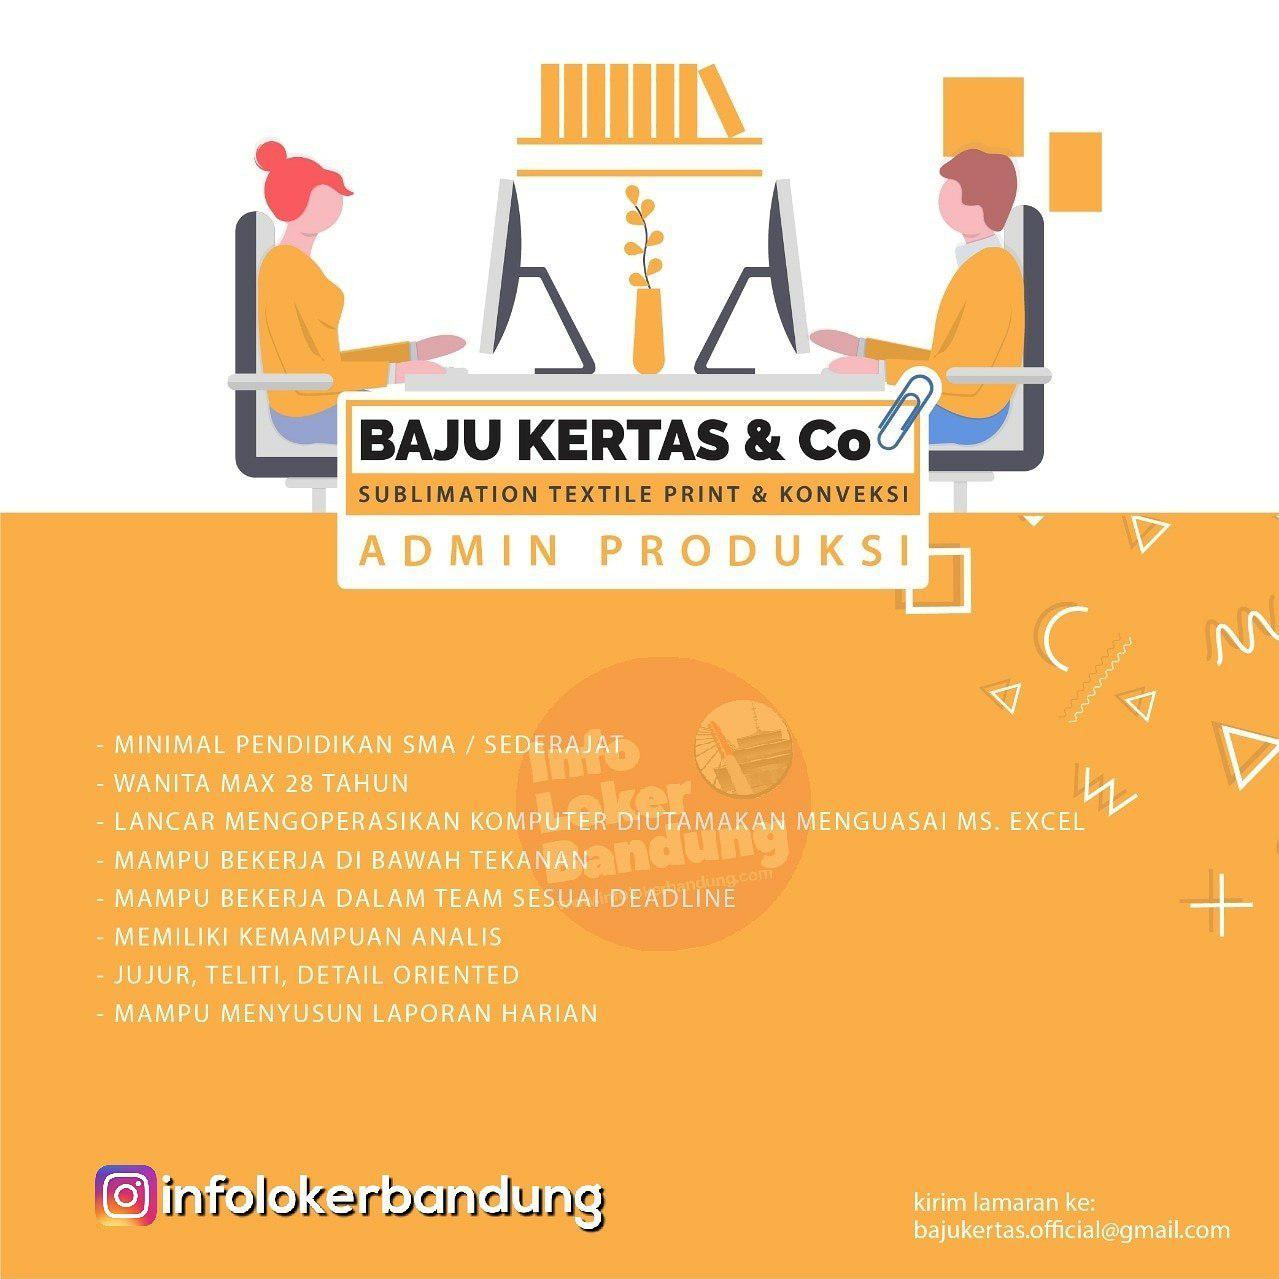 Lowongan Kerja Baju Kertas & Co Bandung Februari 2019